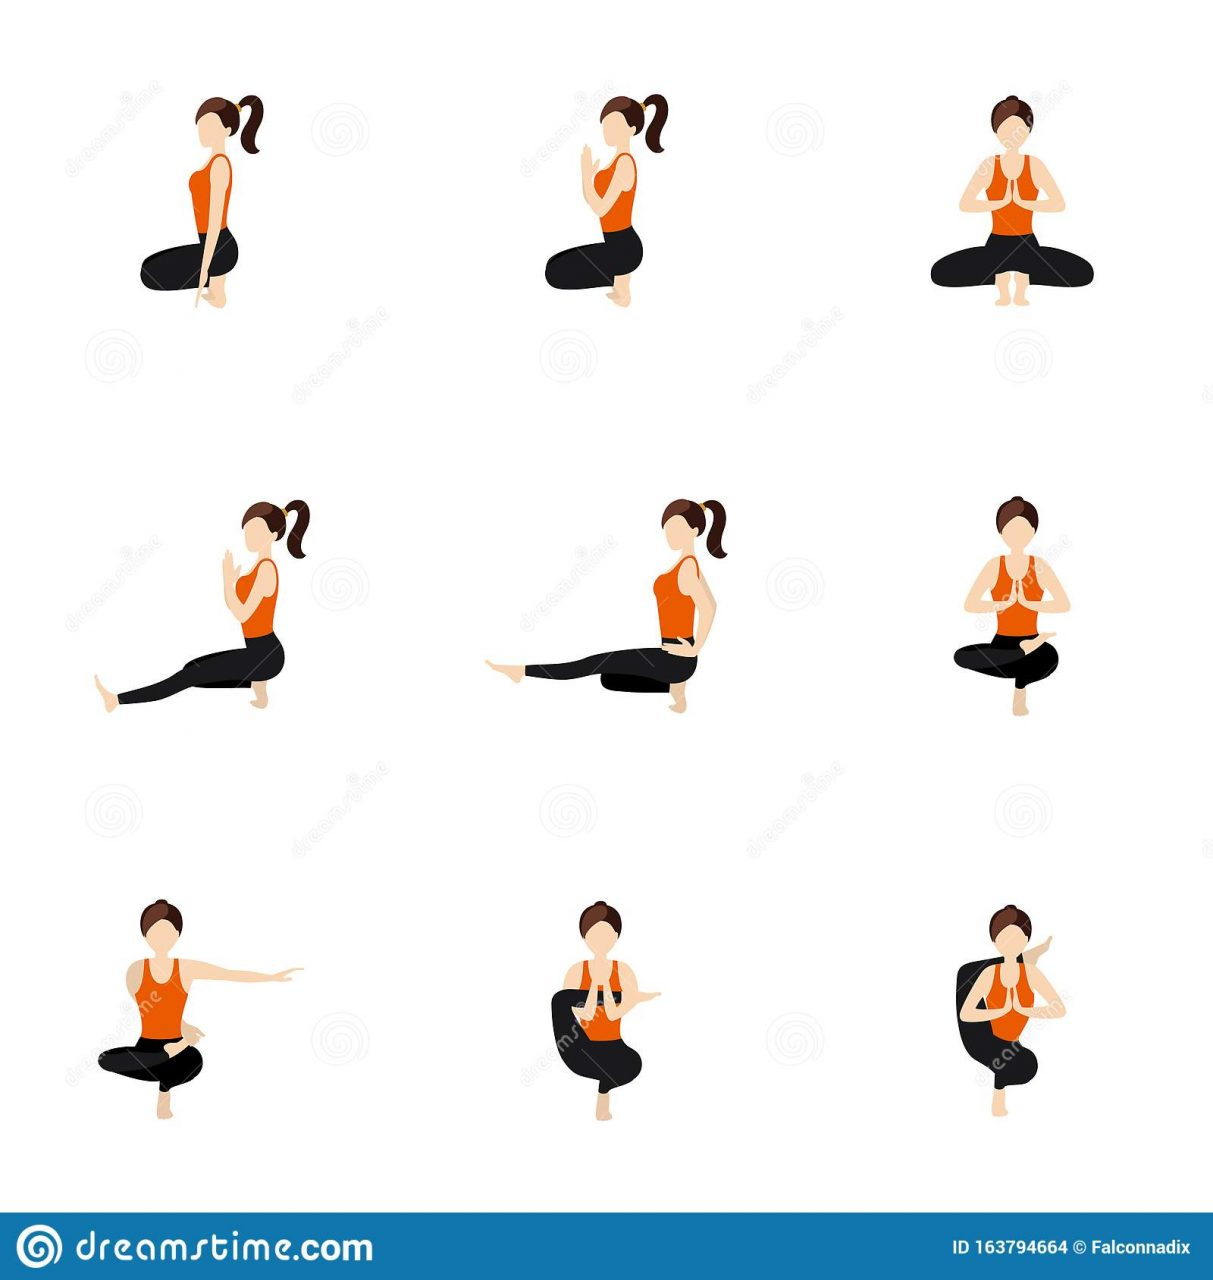 En este momento estás viendo Posturas yoga sentada